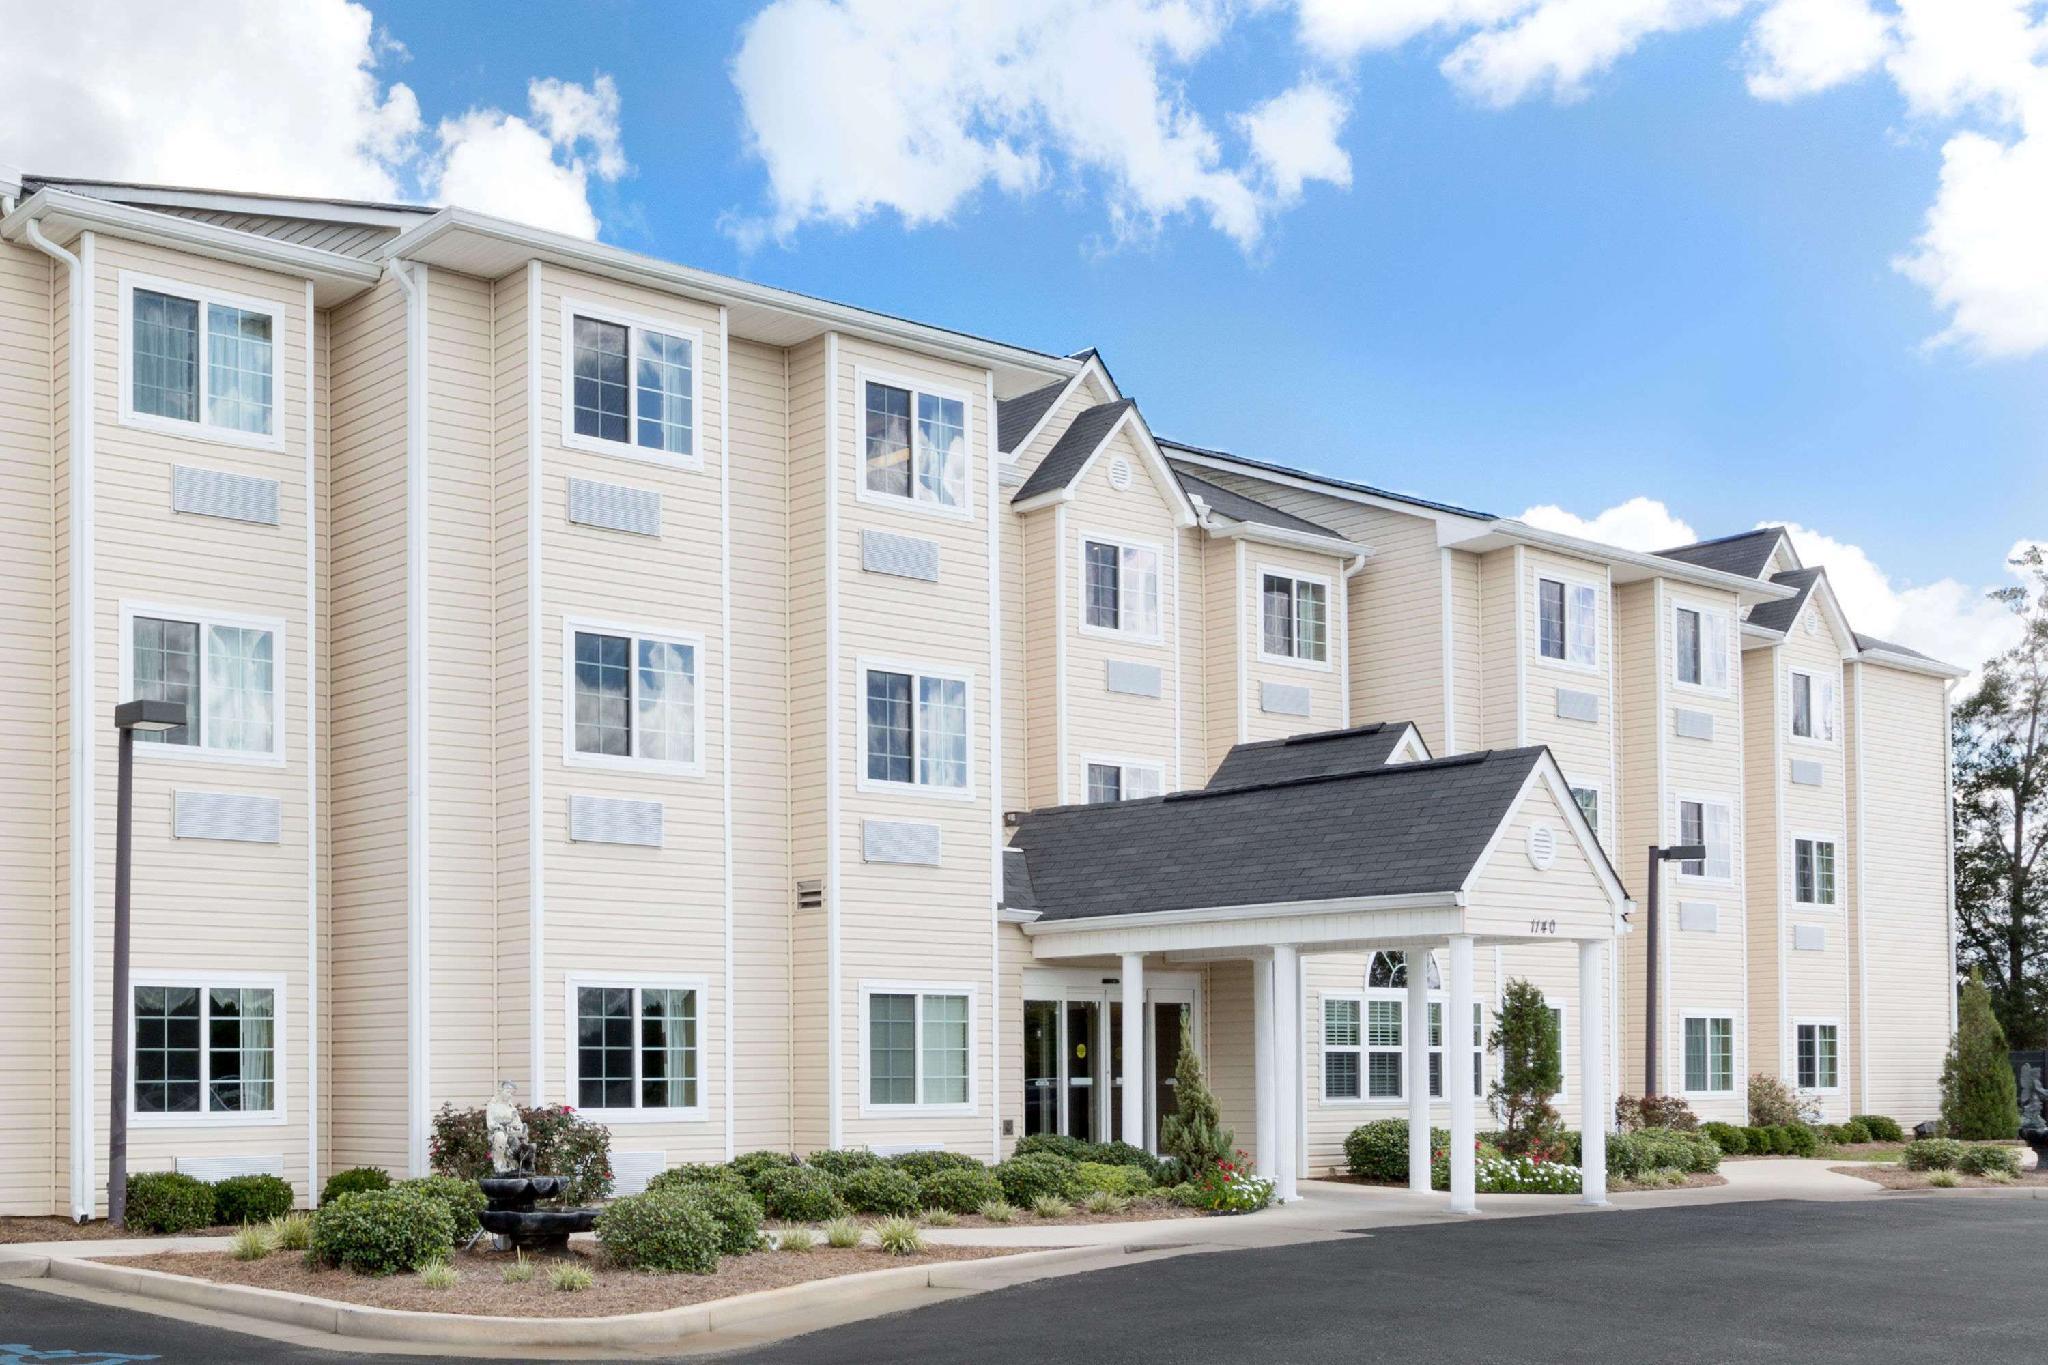 Microtel Inn And Suites By Wyndham Ozark